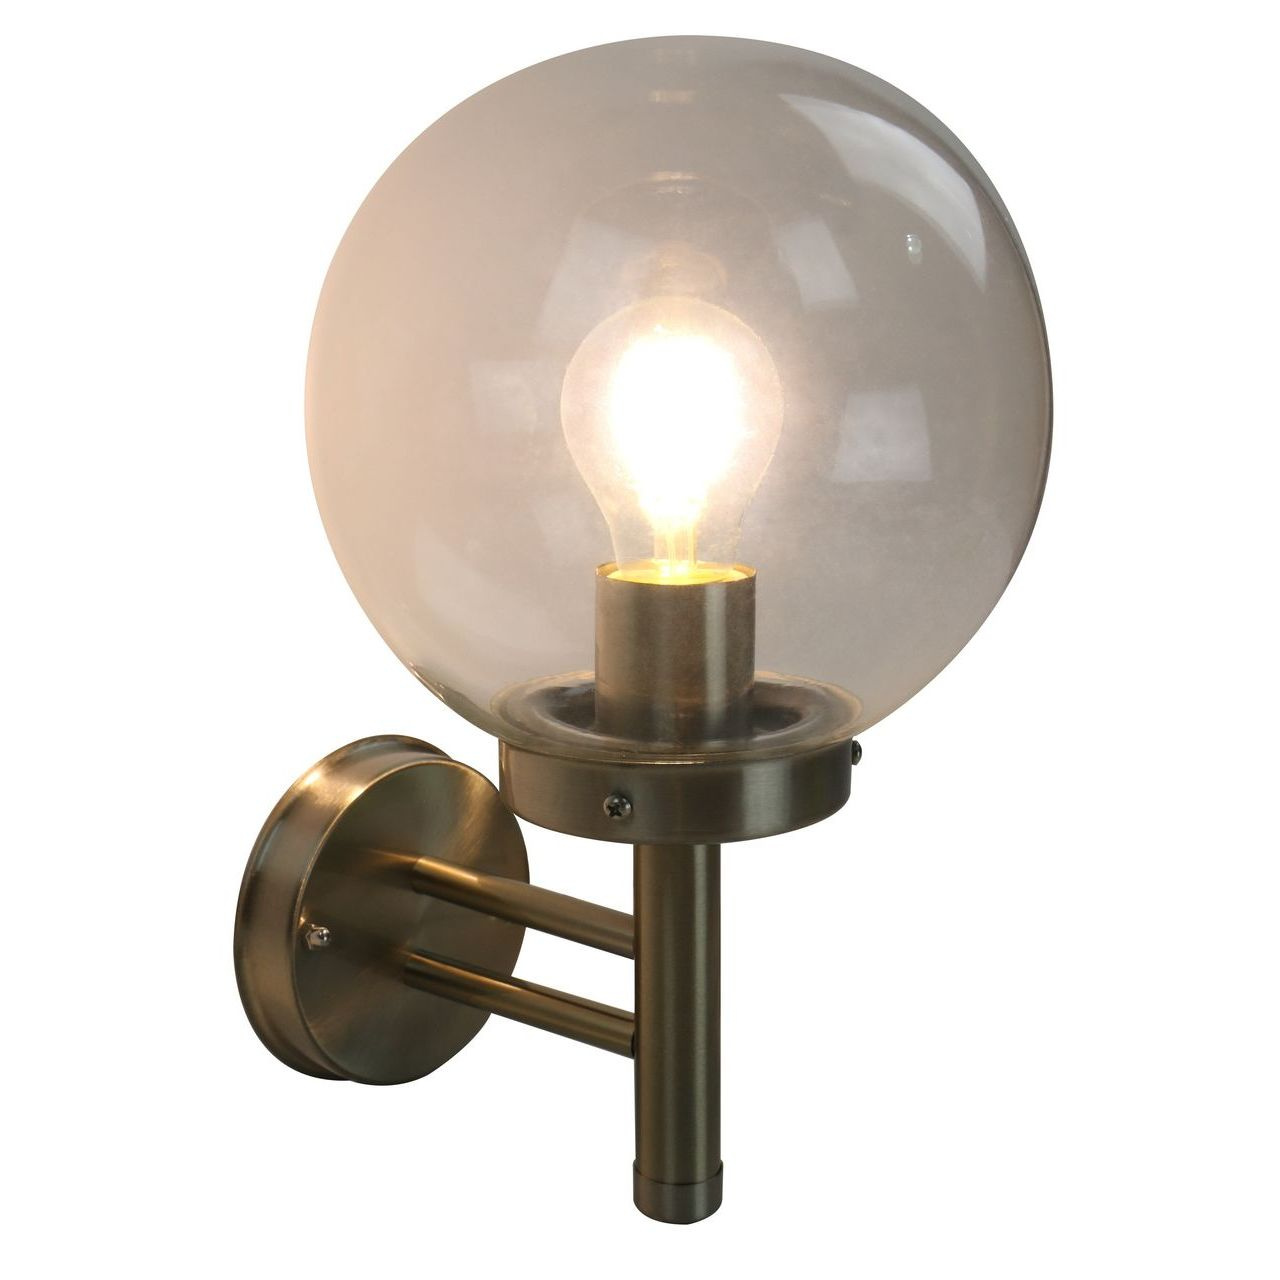 Фото - Уличный настенный светильник Arte Lamp Gazebo A8365AL-1SS arte lamp уличный настенный светильник intrigo a8161al 1ss